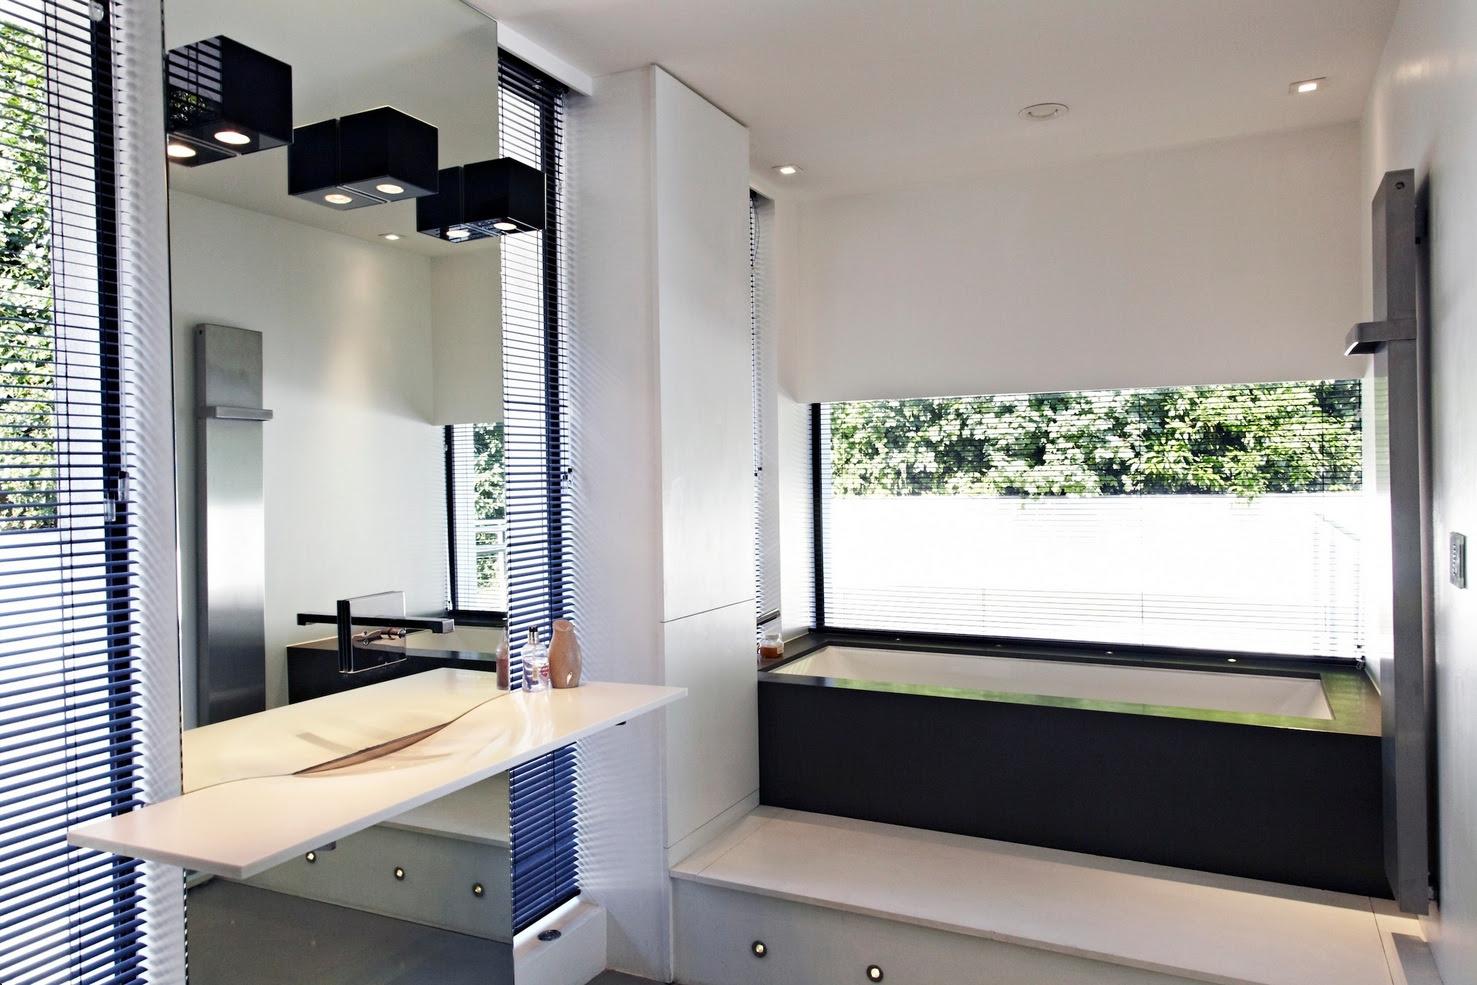 Contoh Soal Dan Contoh Pidato Lengkap Bathroom Mirror Design Ideas